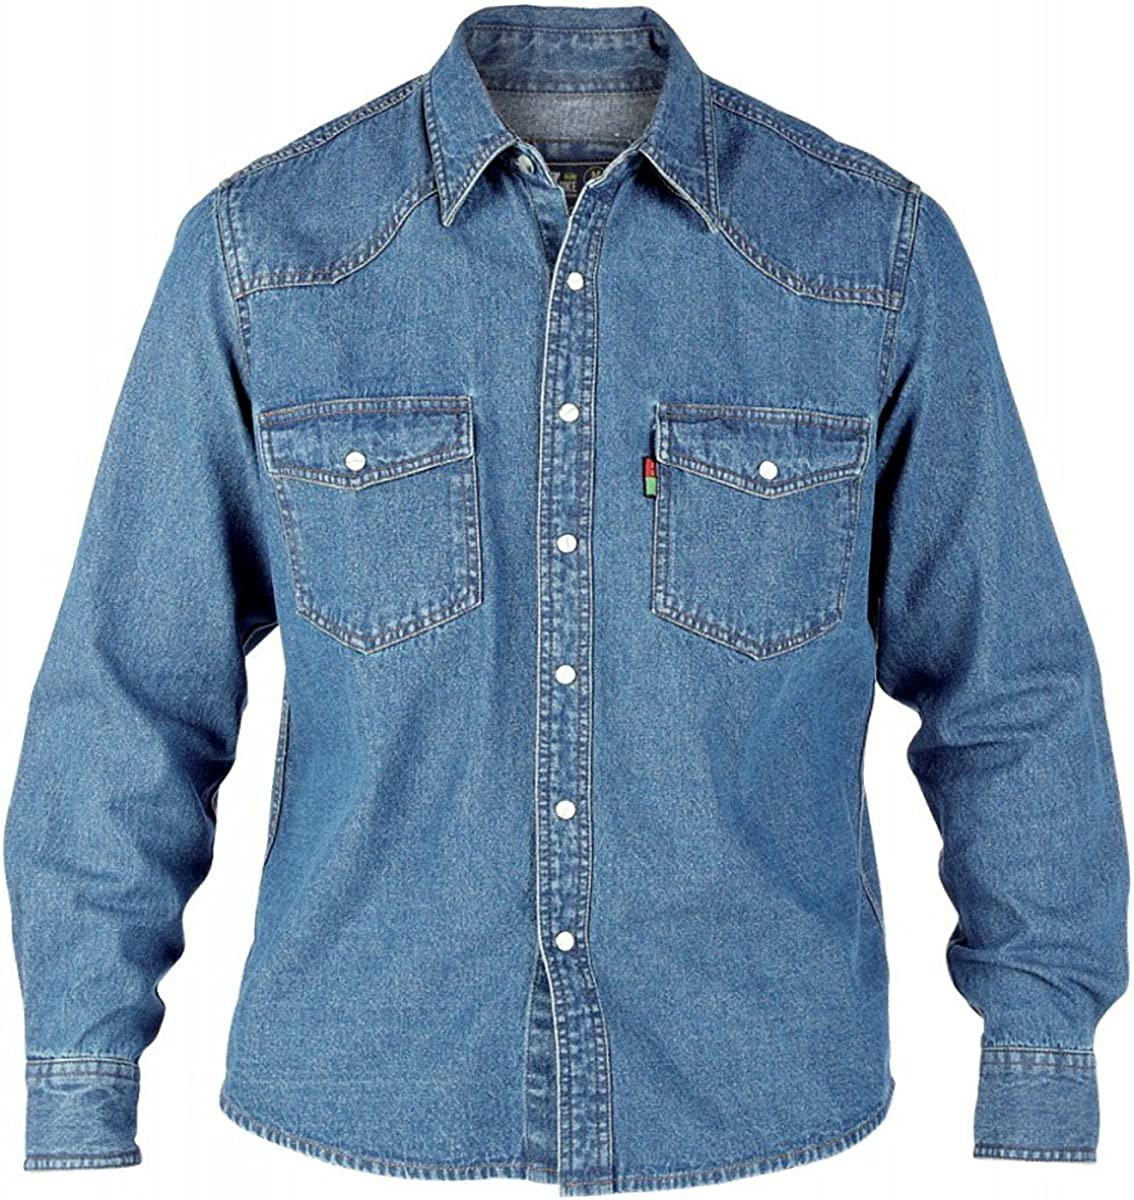 Duke London heeren Jeans Camisa: Amazon.es: Ropa y accesorios